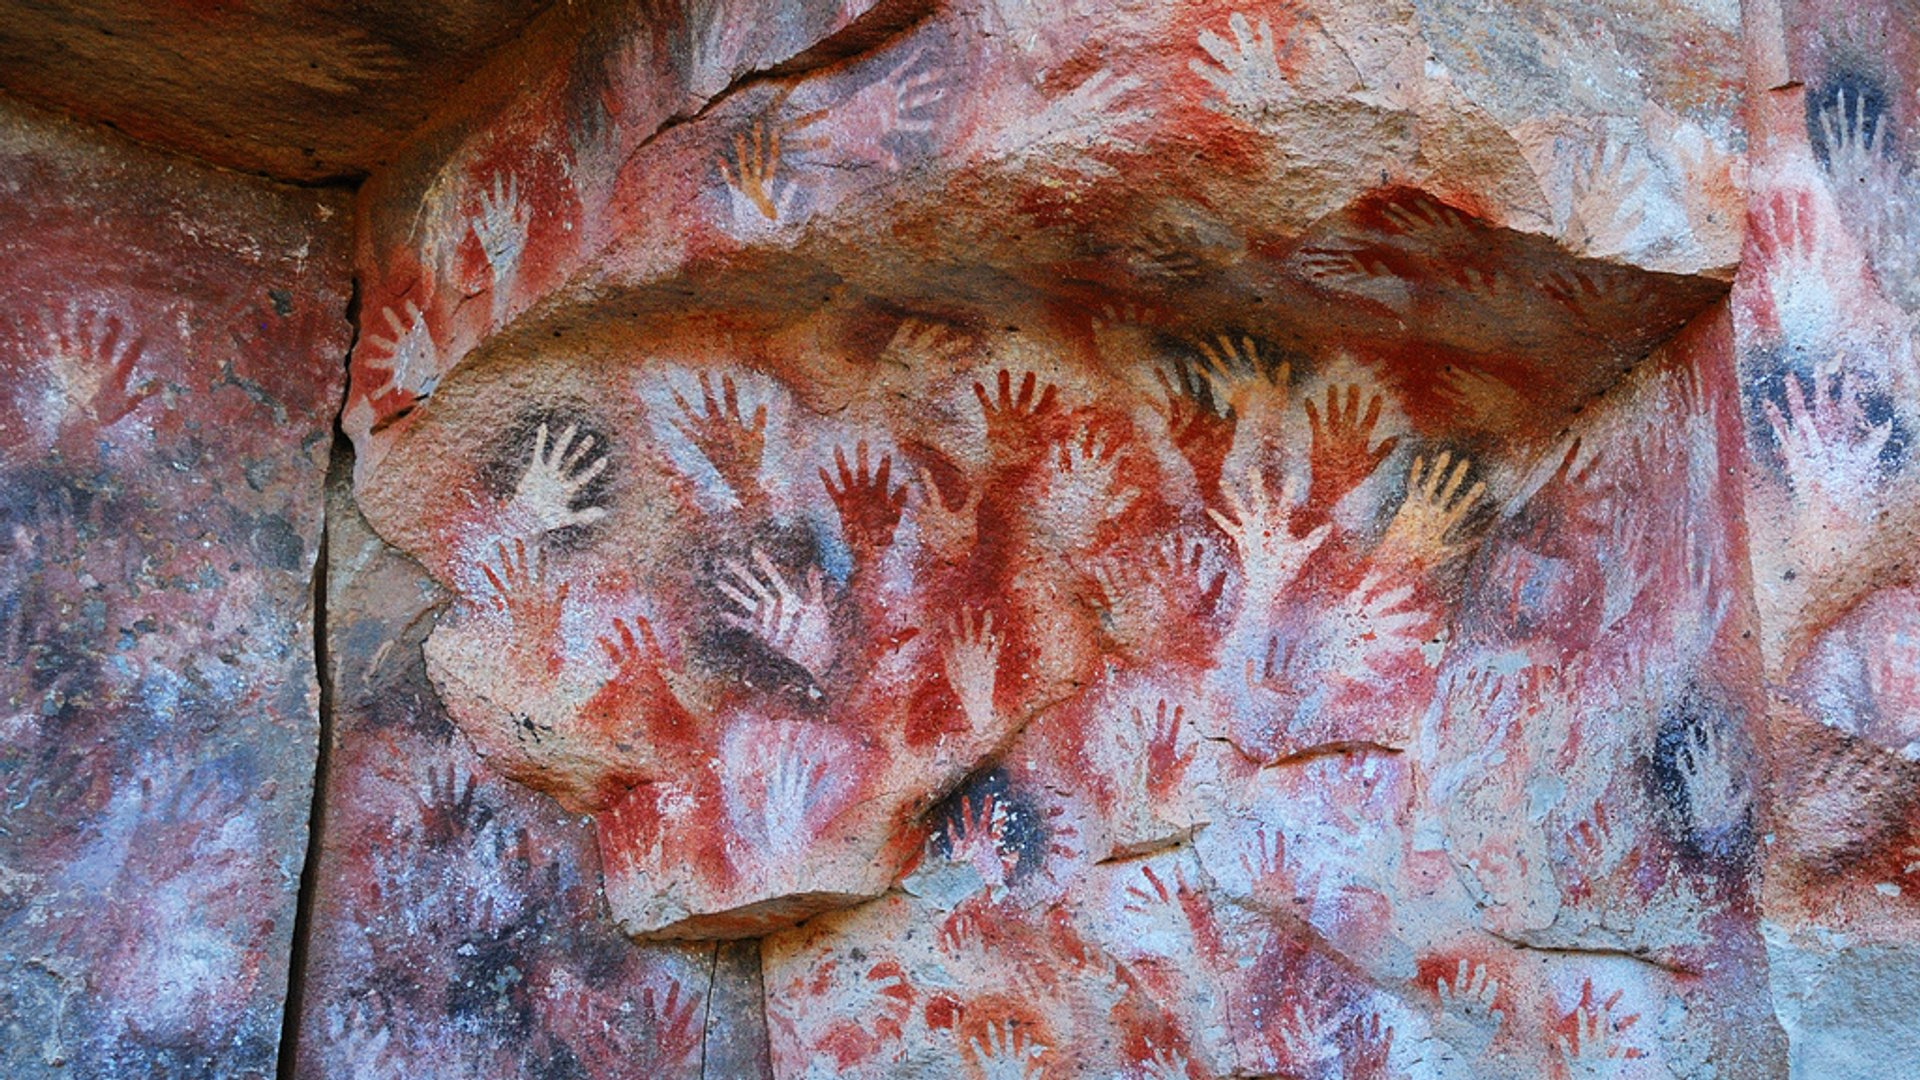 Cueva de las Manos (Cave of the Hands) in Argentina - Best Time